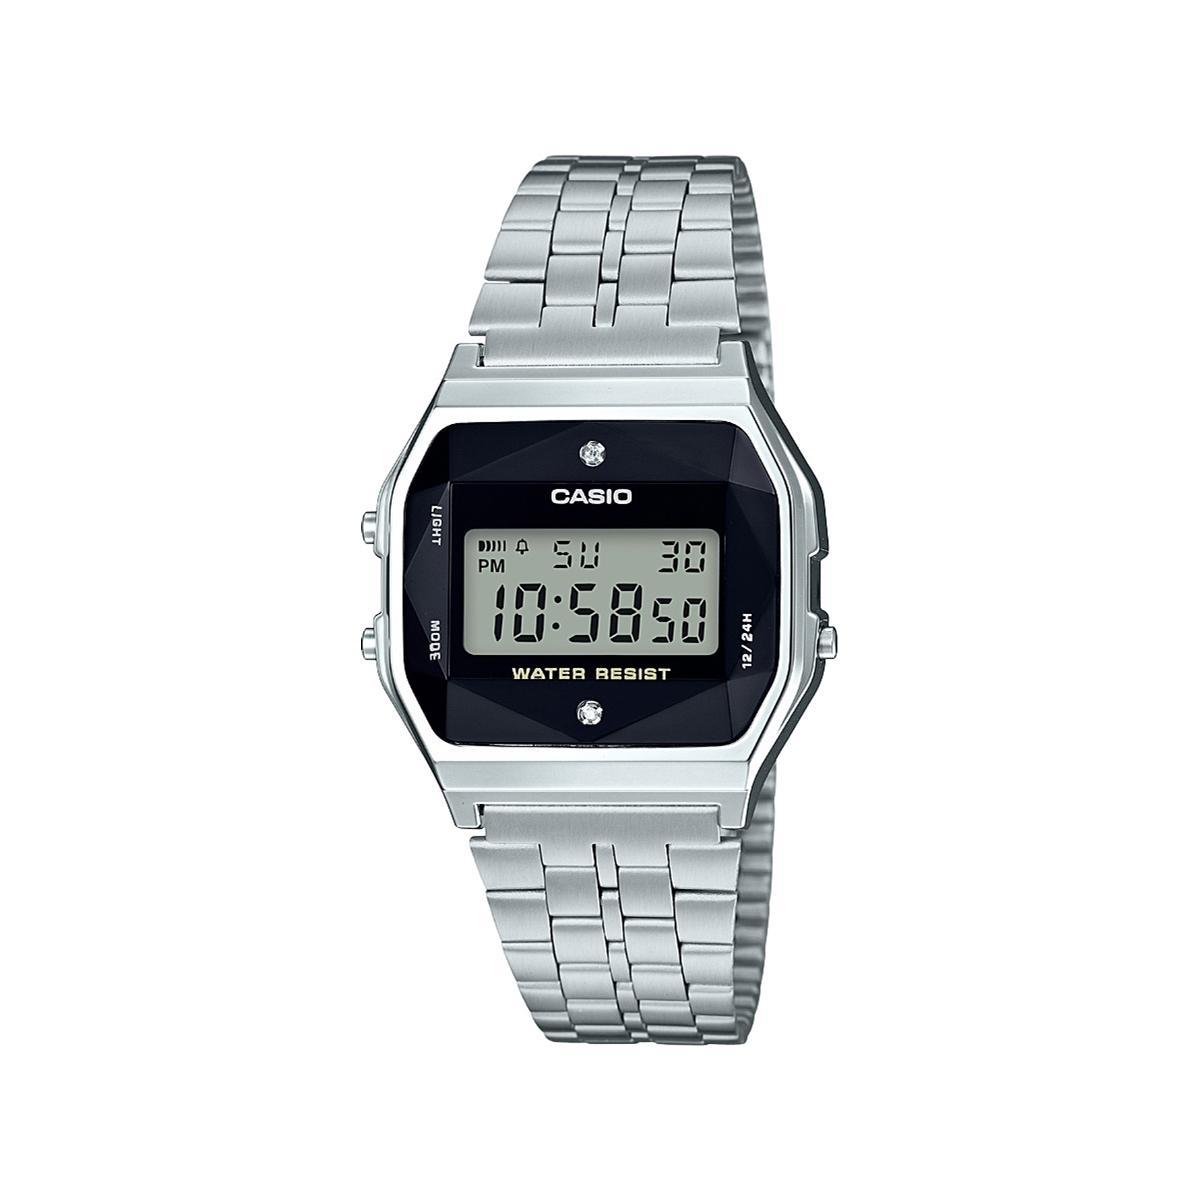 f342f4f838d Relógio Casio Vintage Diamond Prata - A159WAD-1DF-BR Produto não disponível